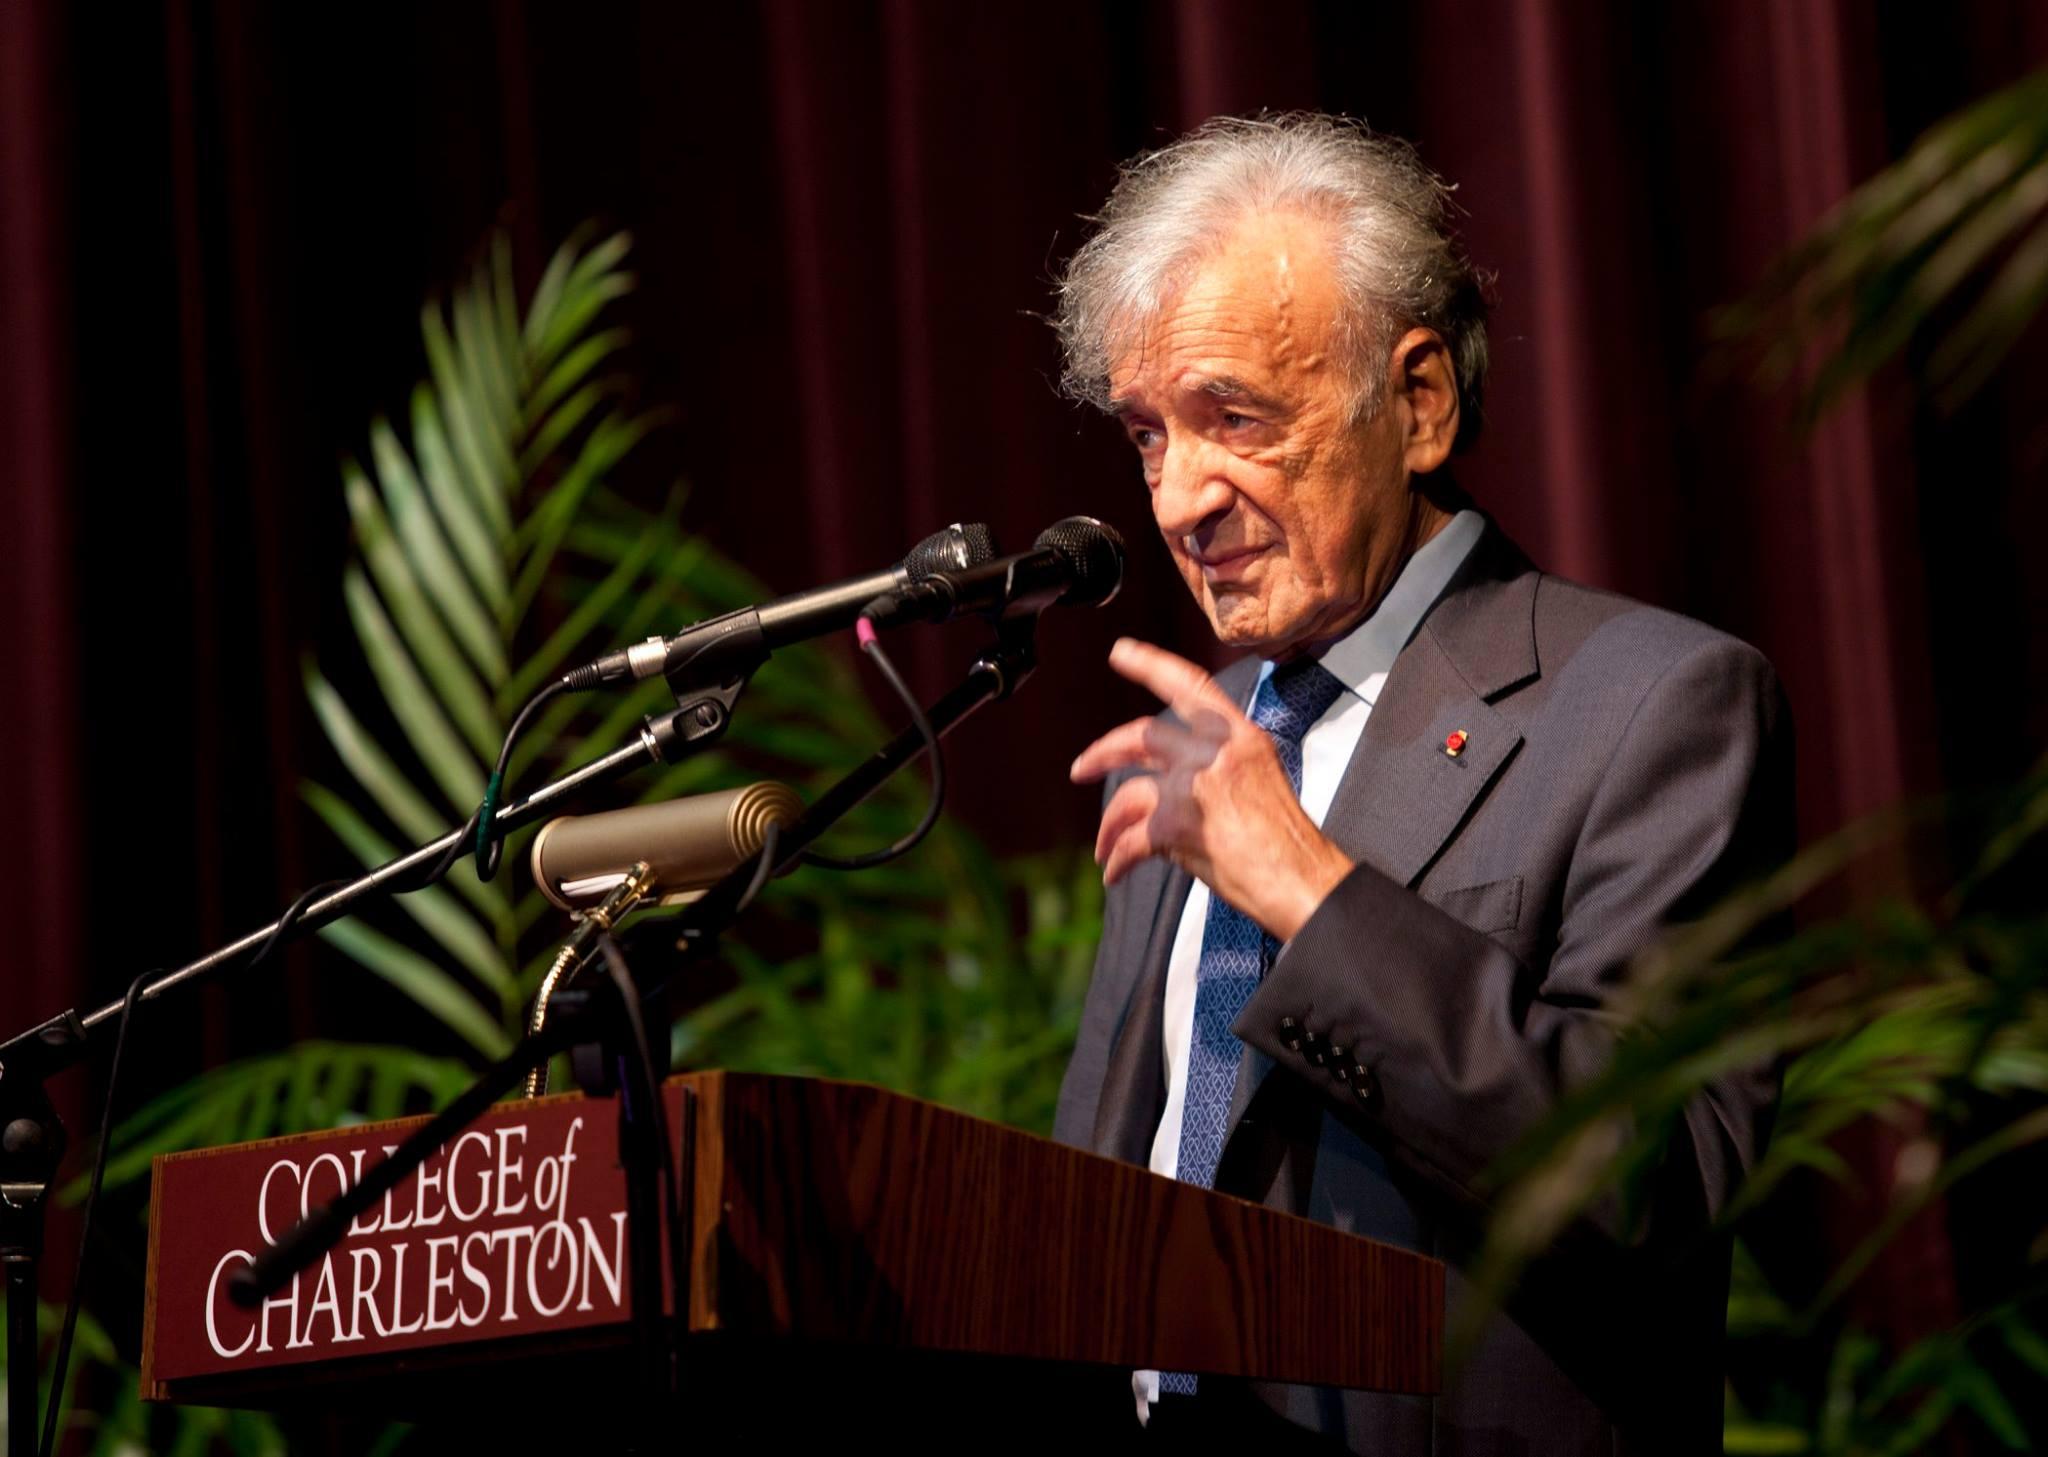 Elie Weisel speaking at the College of Charleston